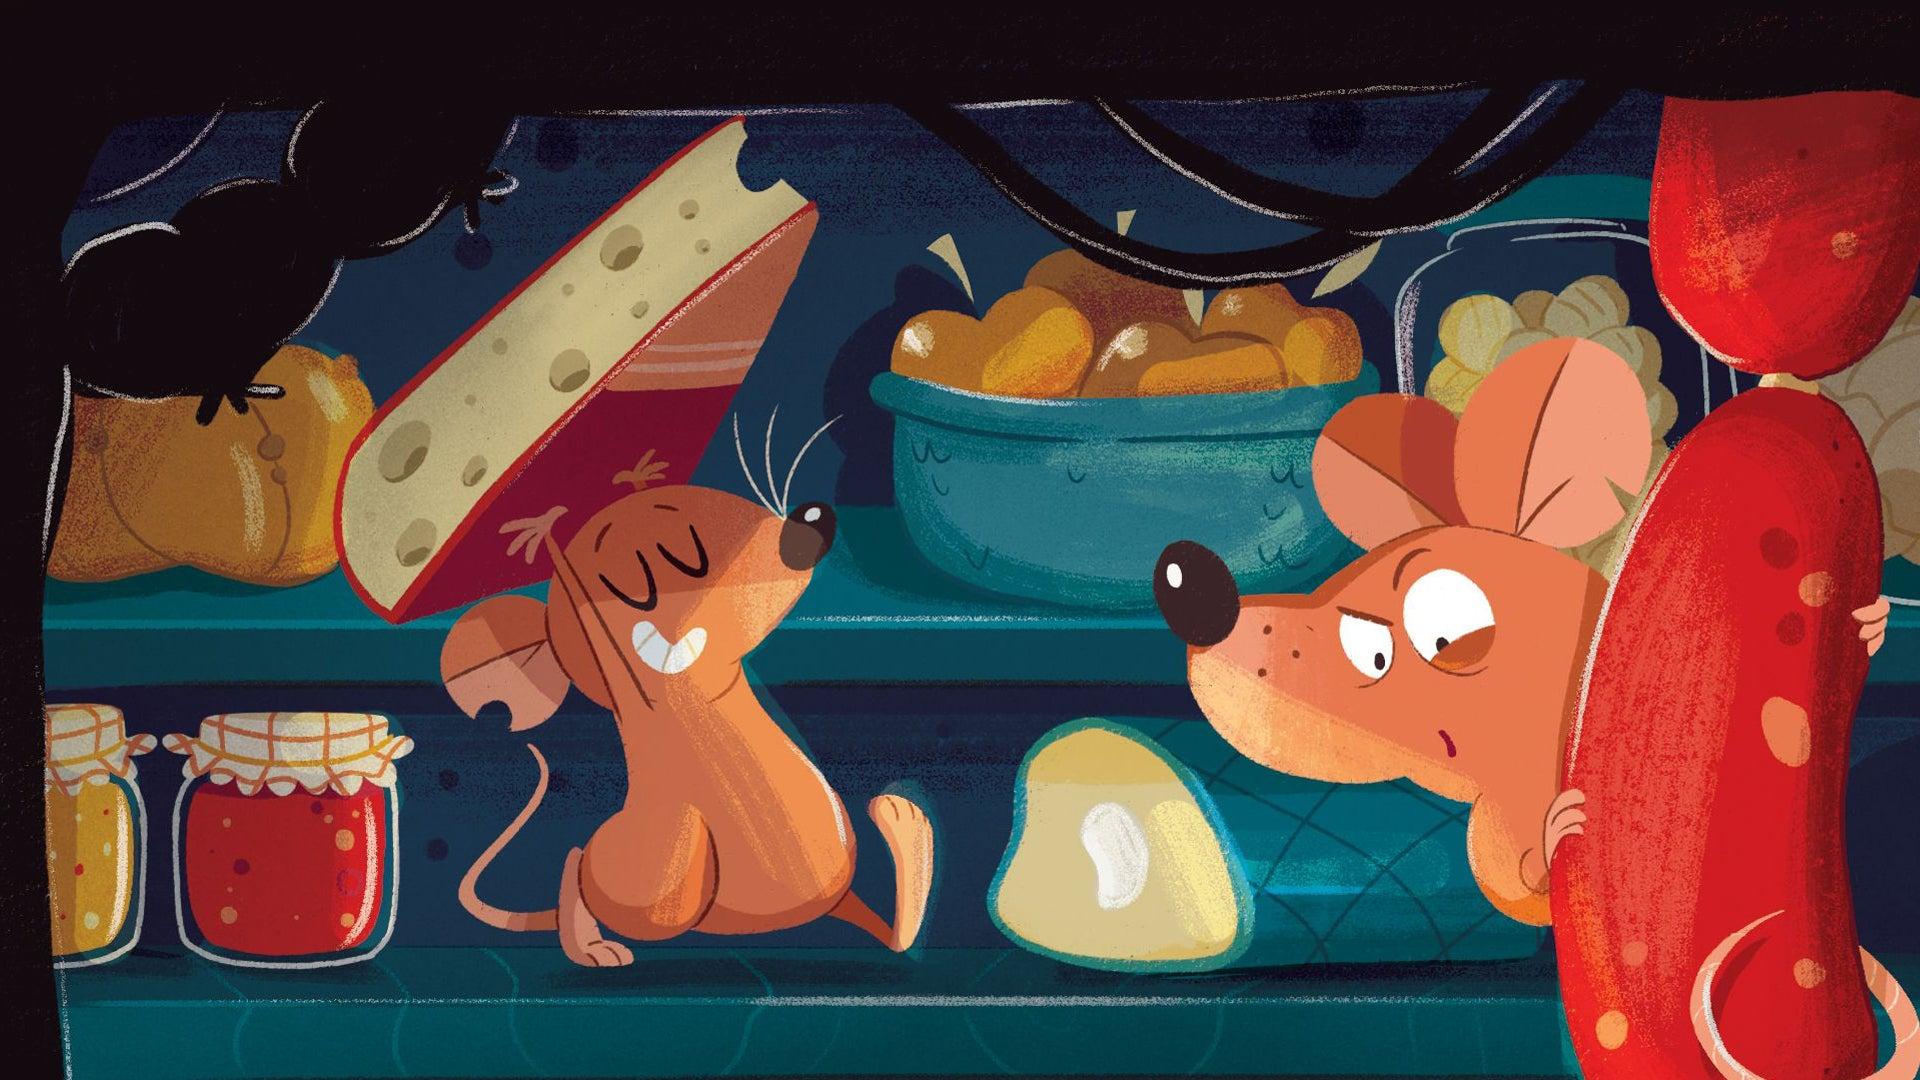 Ratzzia board game artwork